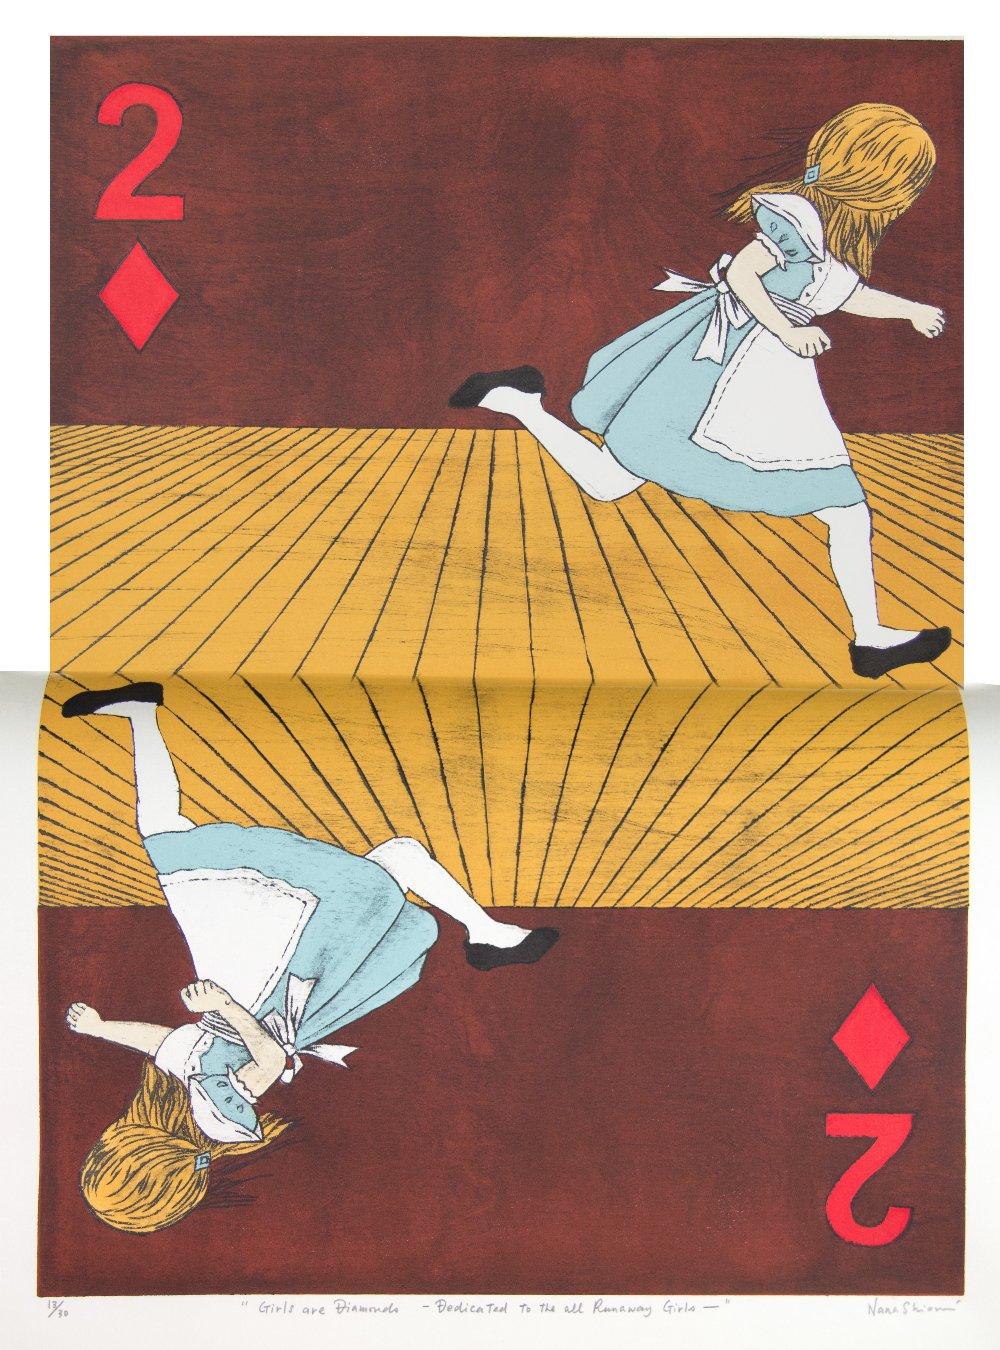 Nana Shiomi RE (Japanese / British, b.1956). 'Two of Diamonds / Girls are Diamonds - Dedicated to